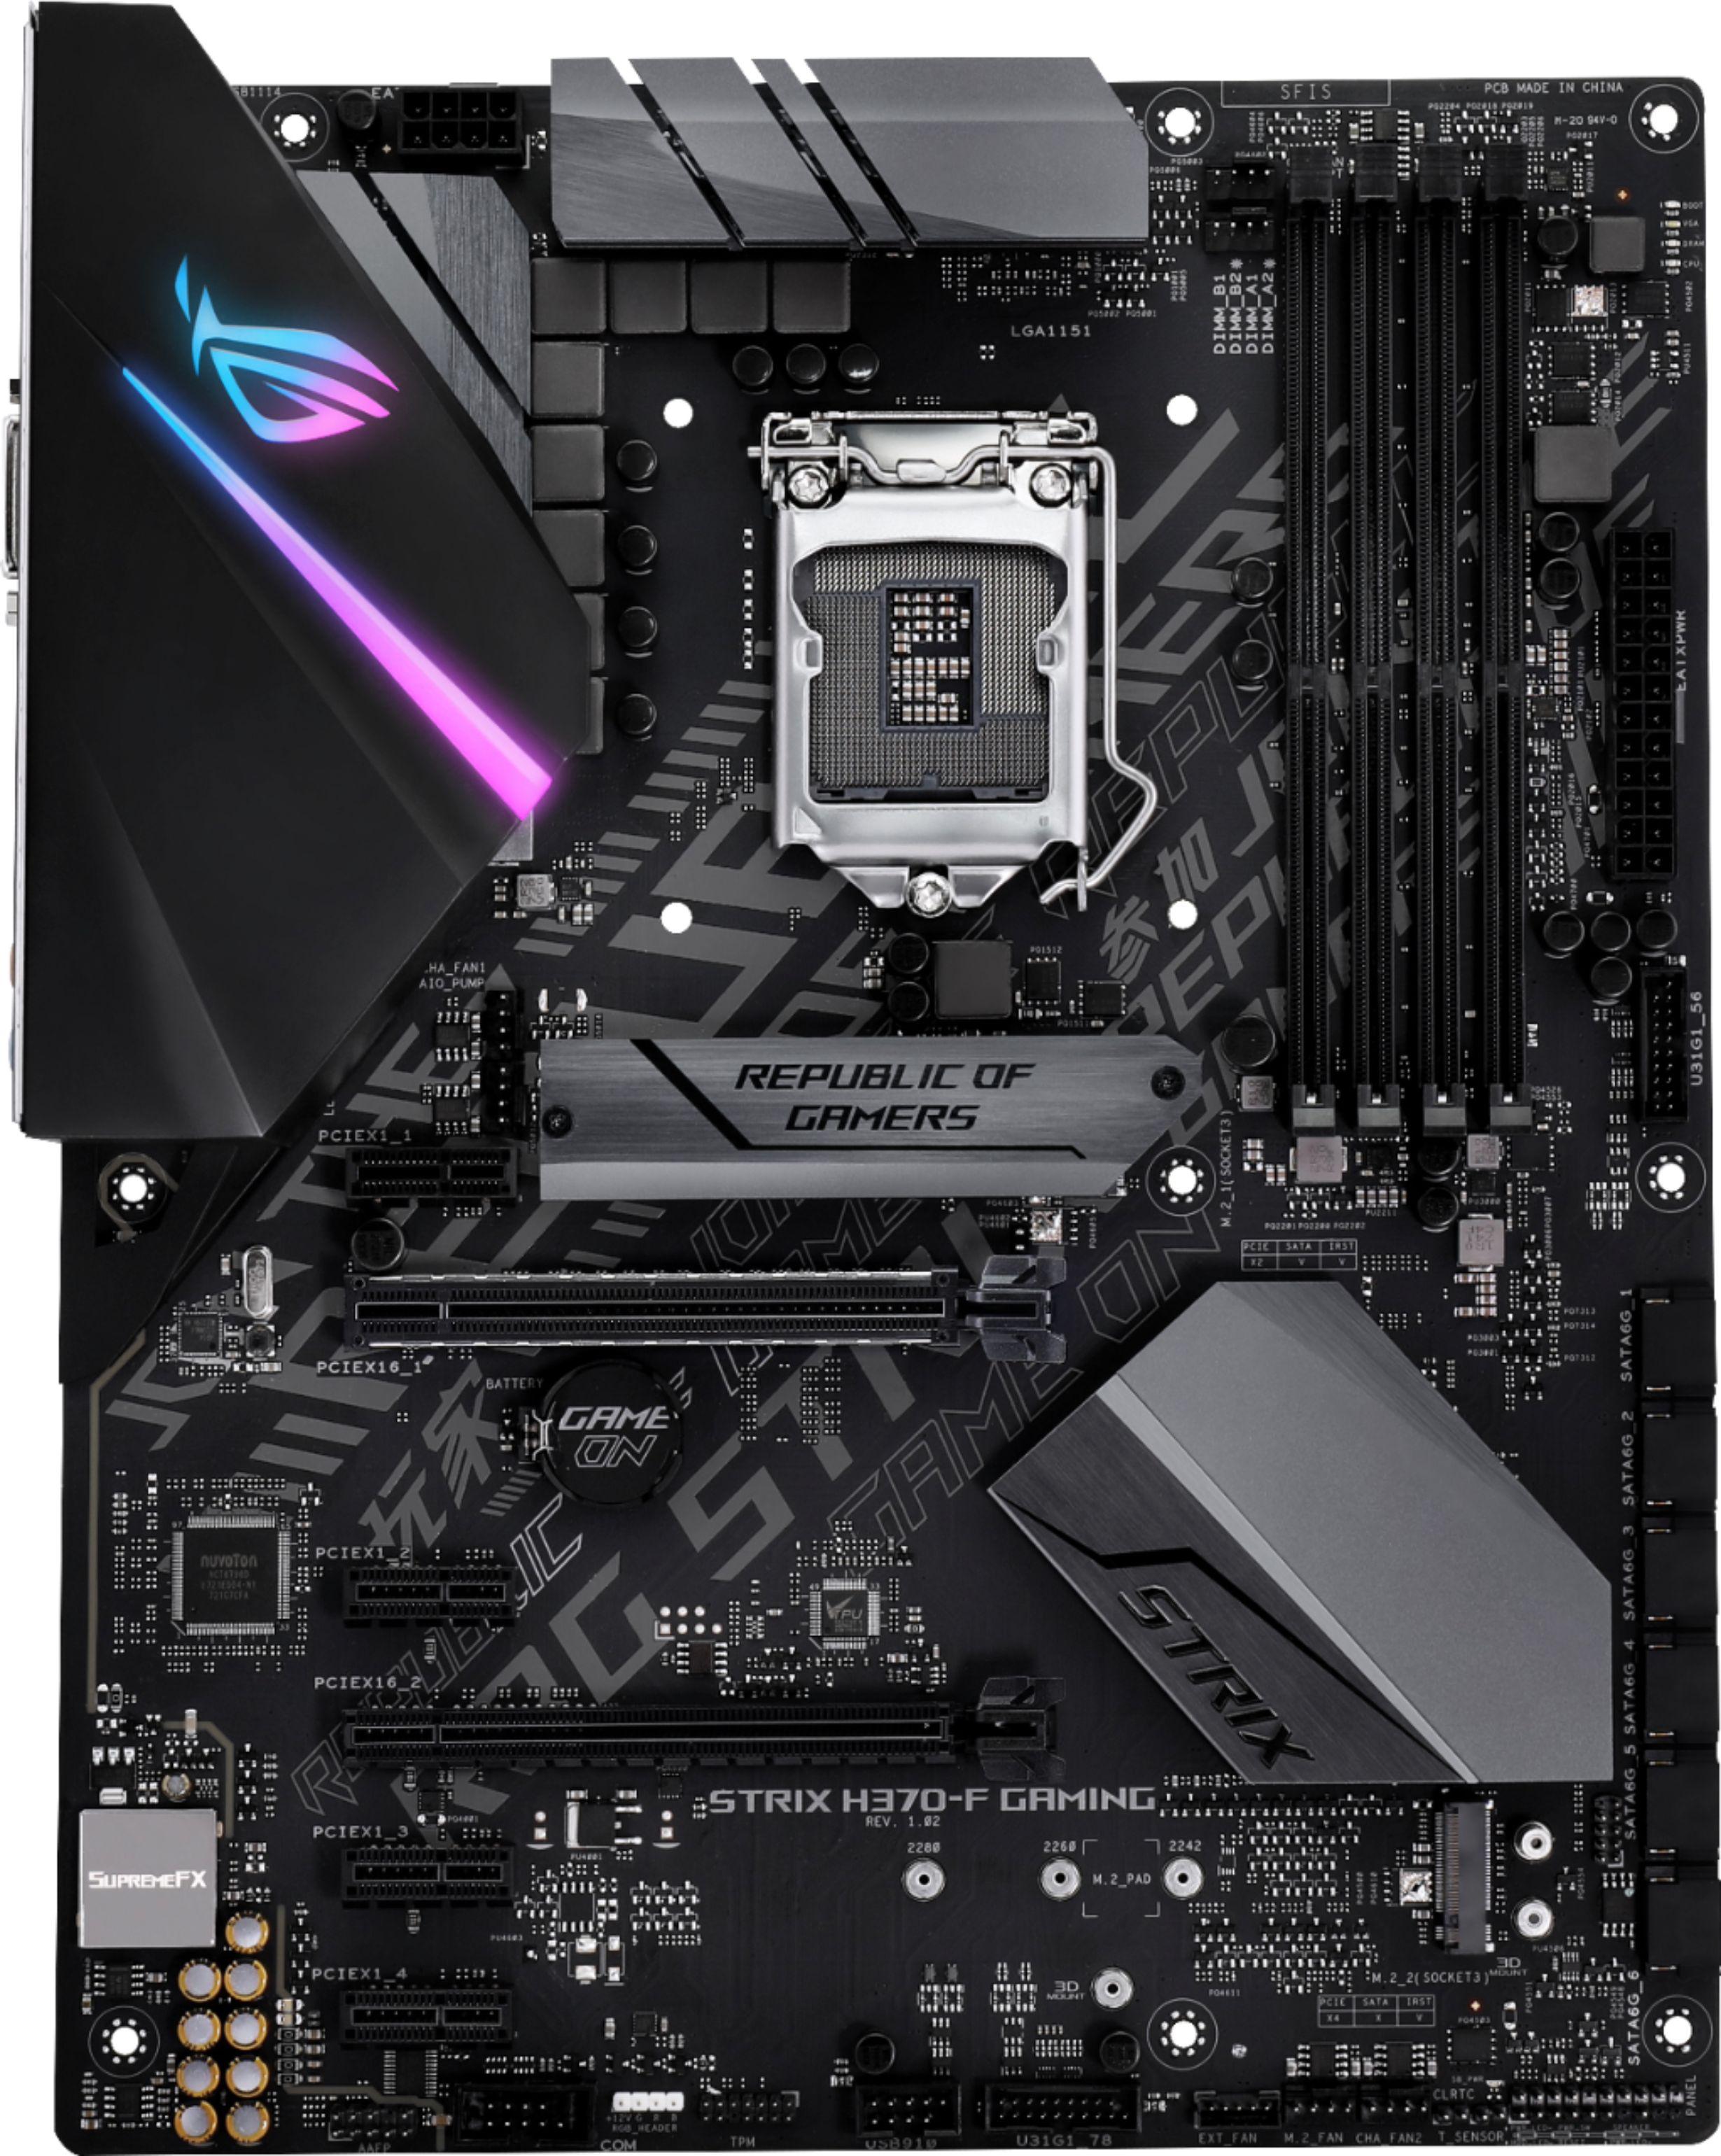 Asus ROG STRIX H370-F GAMING (Socket LGA1151) USB 3.1 Gen 1 Intel Motherboard with LED Lighting STRIX H370-F GAMING